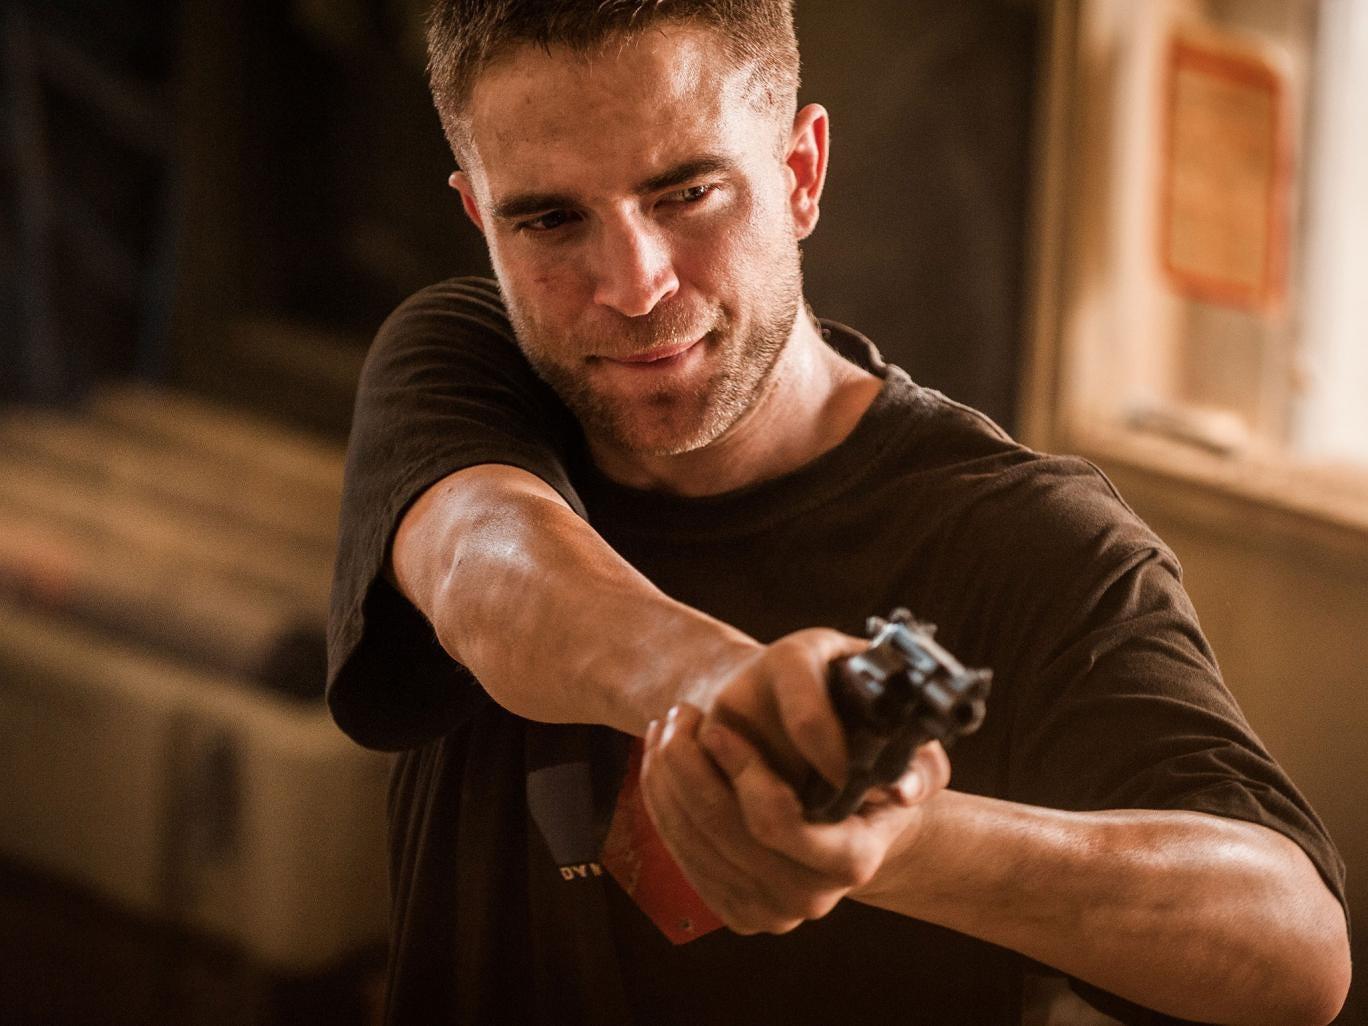 Robert Pattinson in 'The Rover'